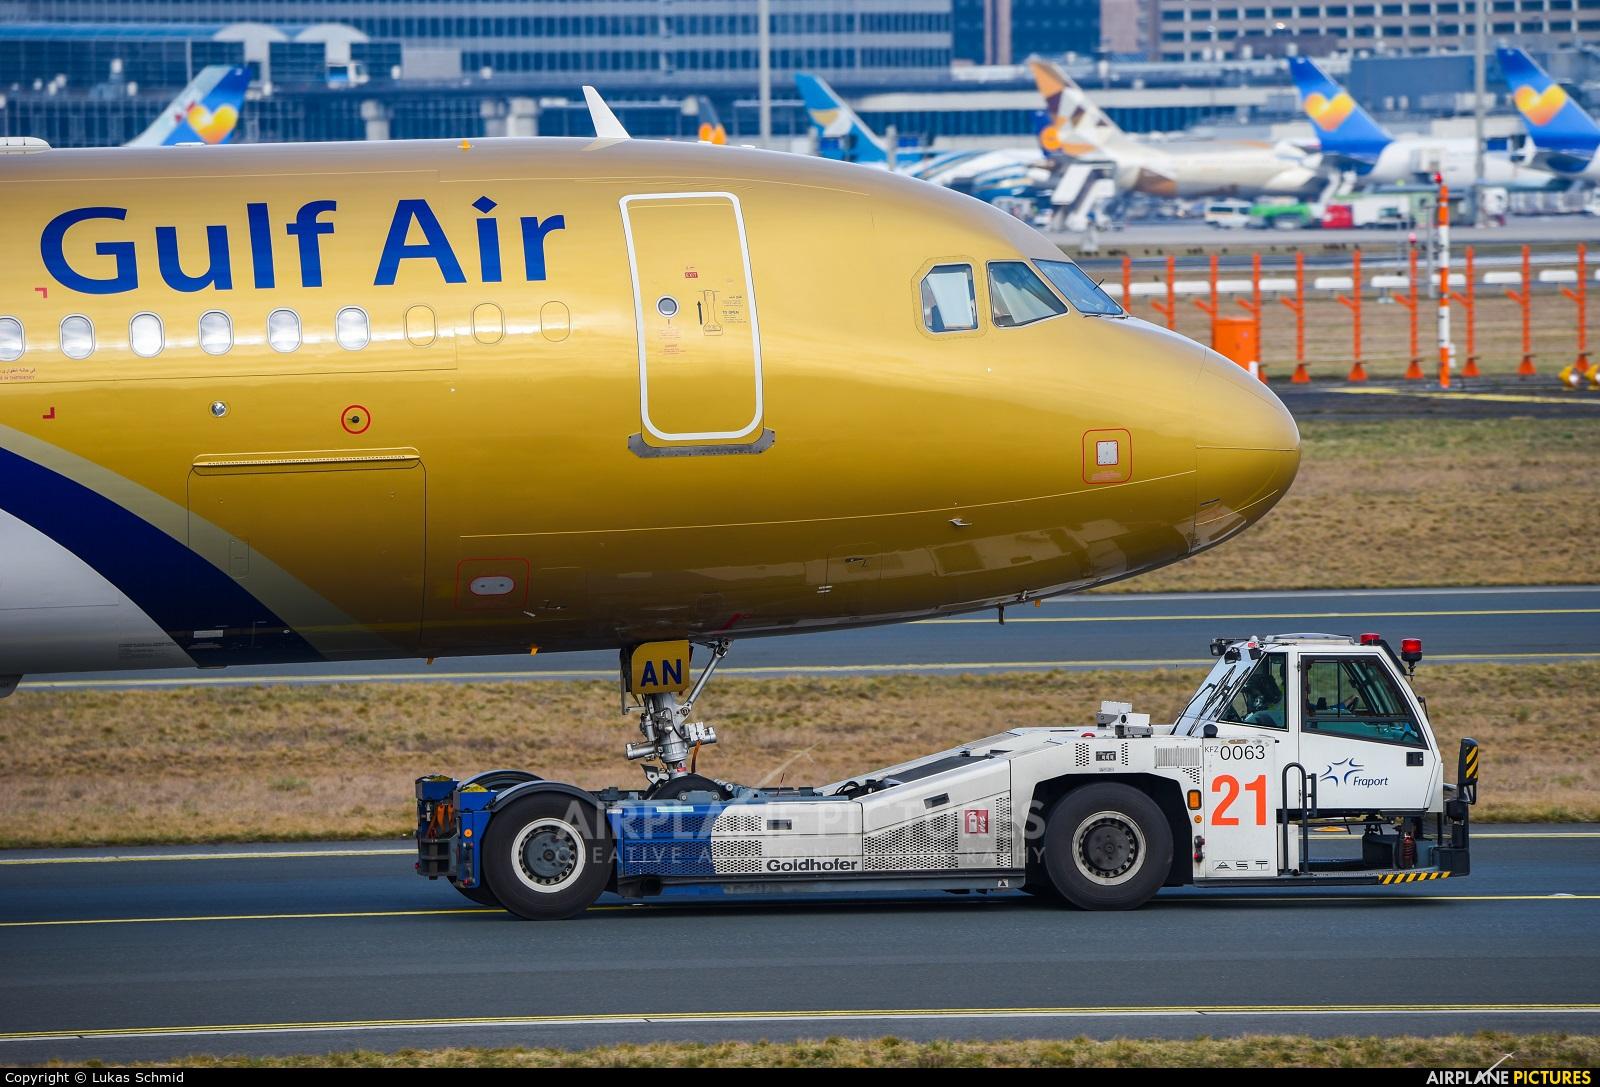 Gulf Air A9C-AN aircraft at Frankfurt